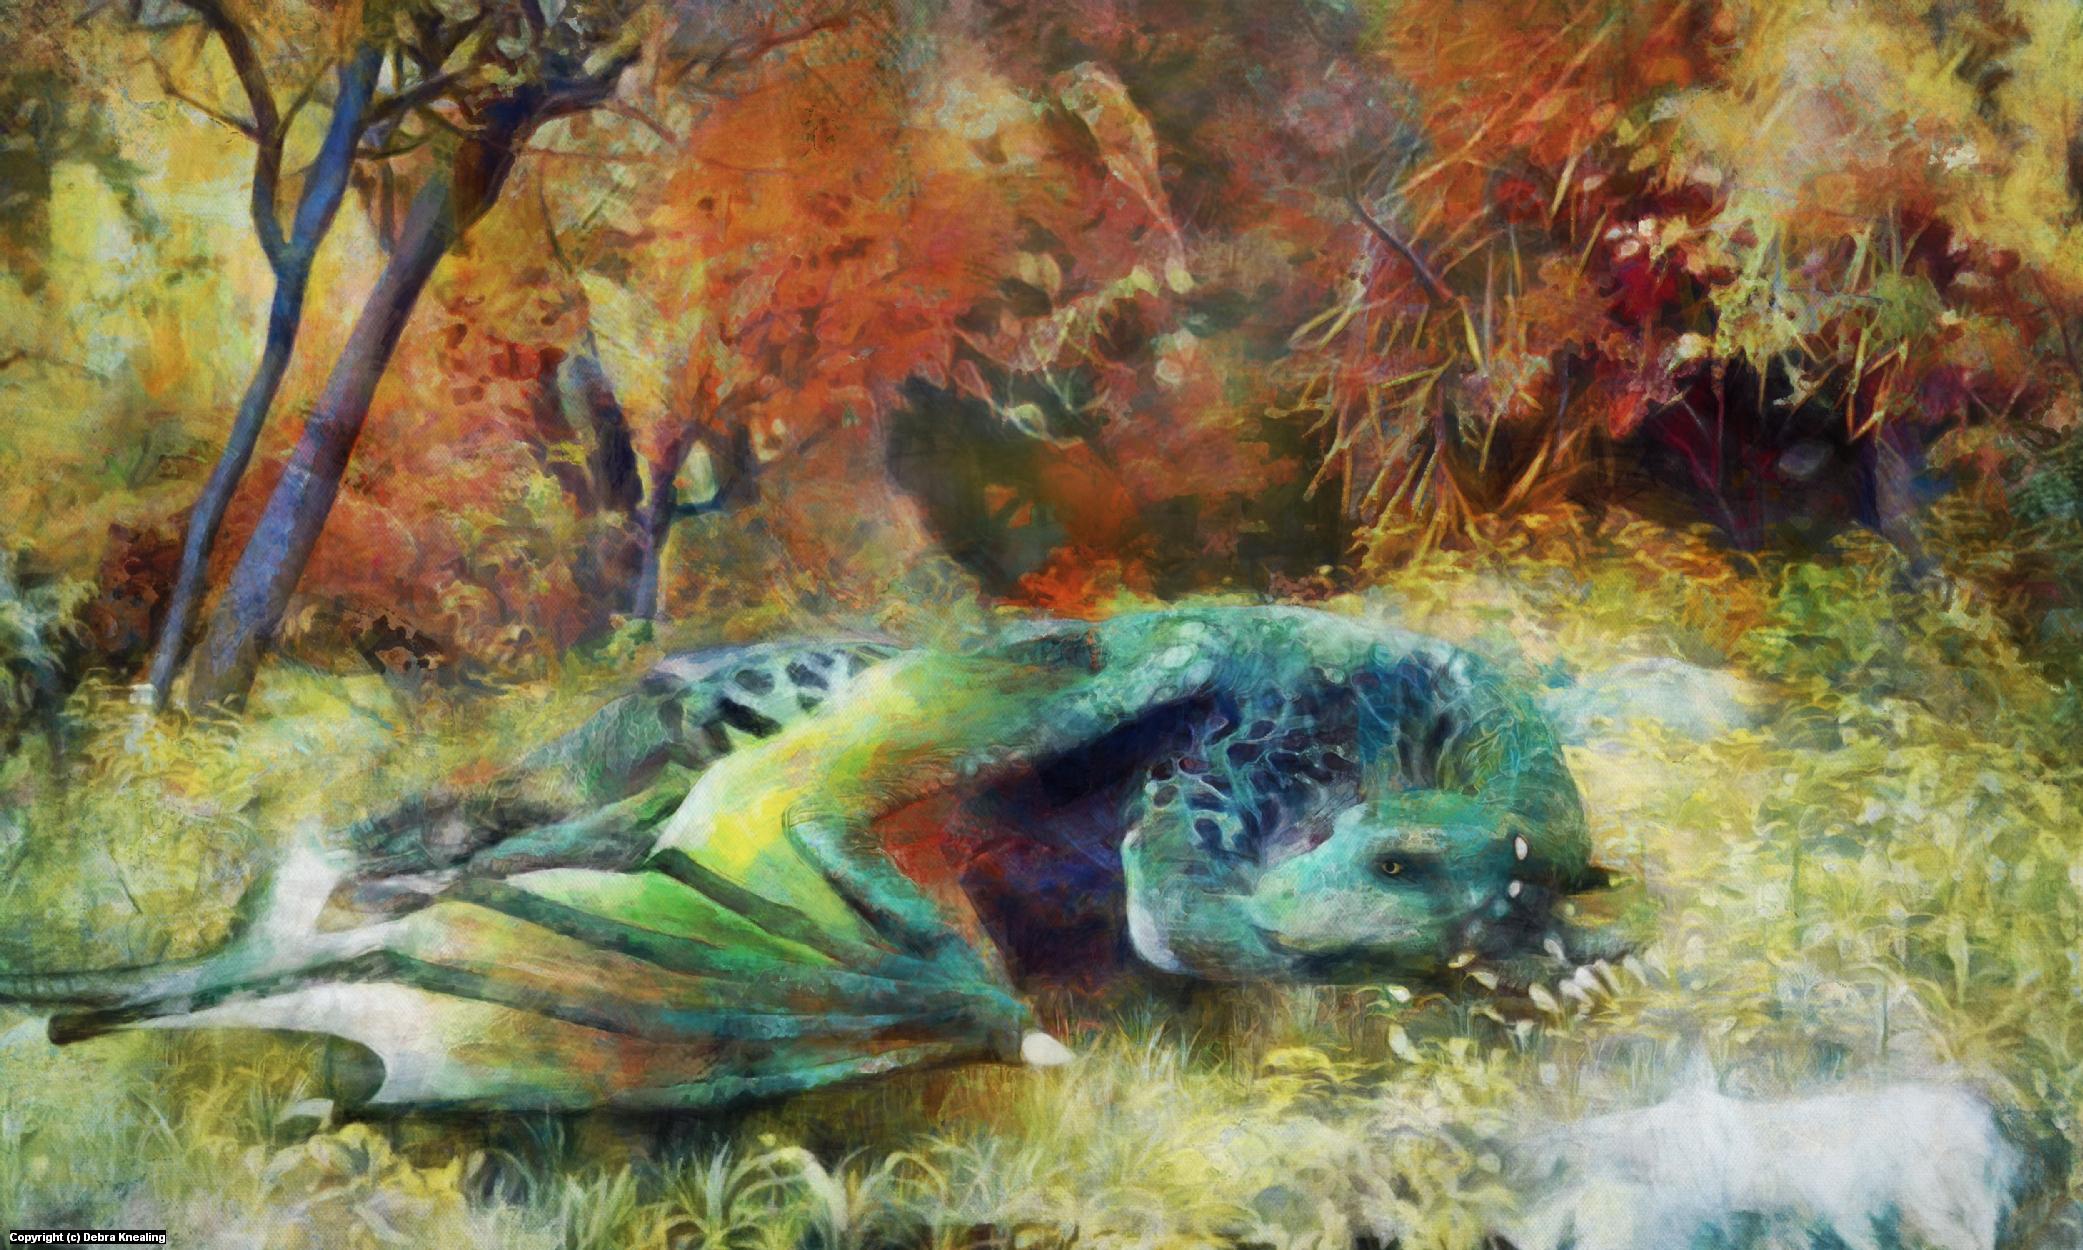 Dragorella Artwork by Debra Knealing